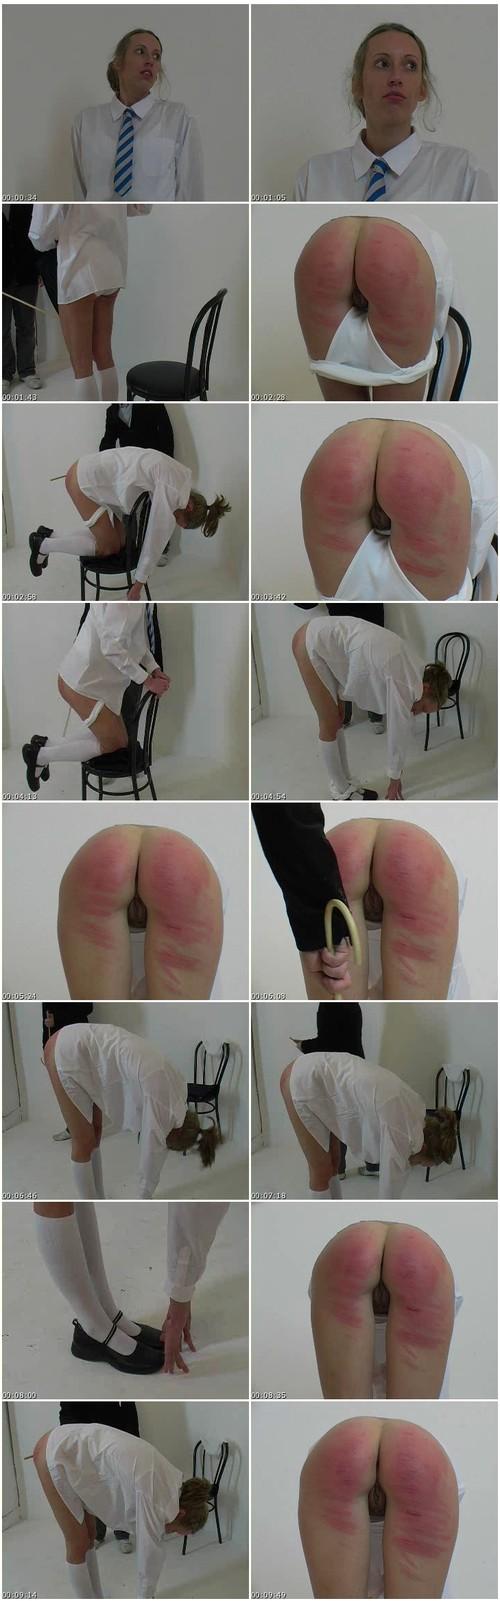 spanking047_thumb_m.jpg